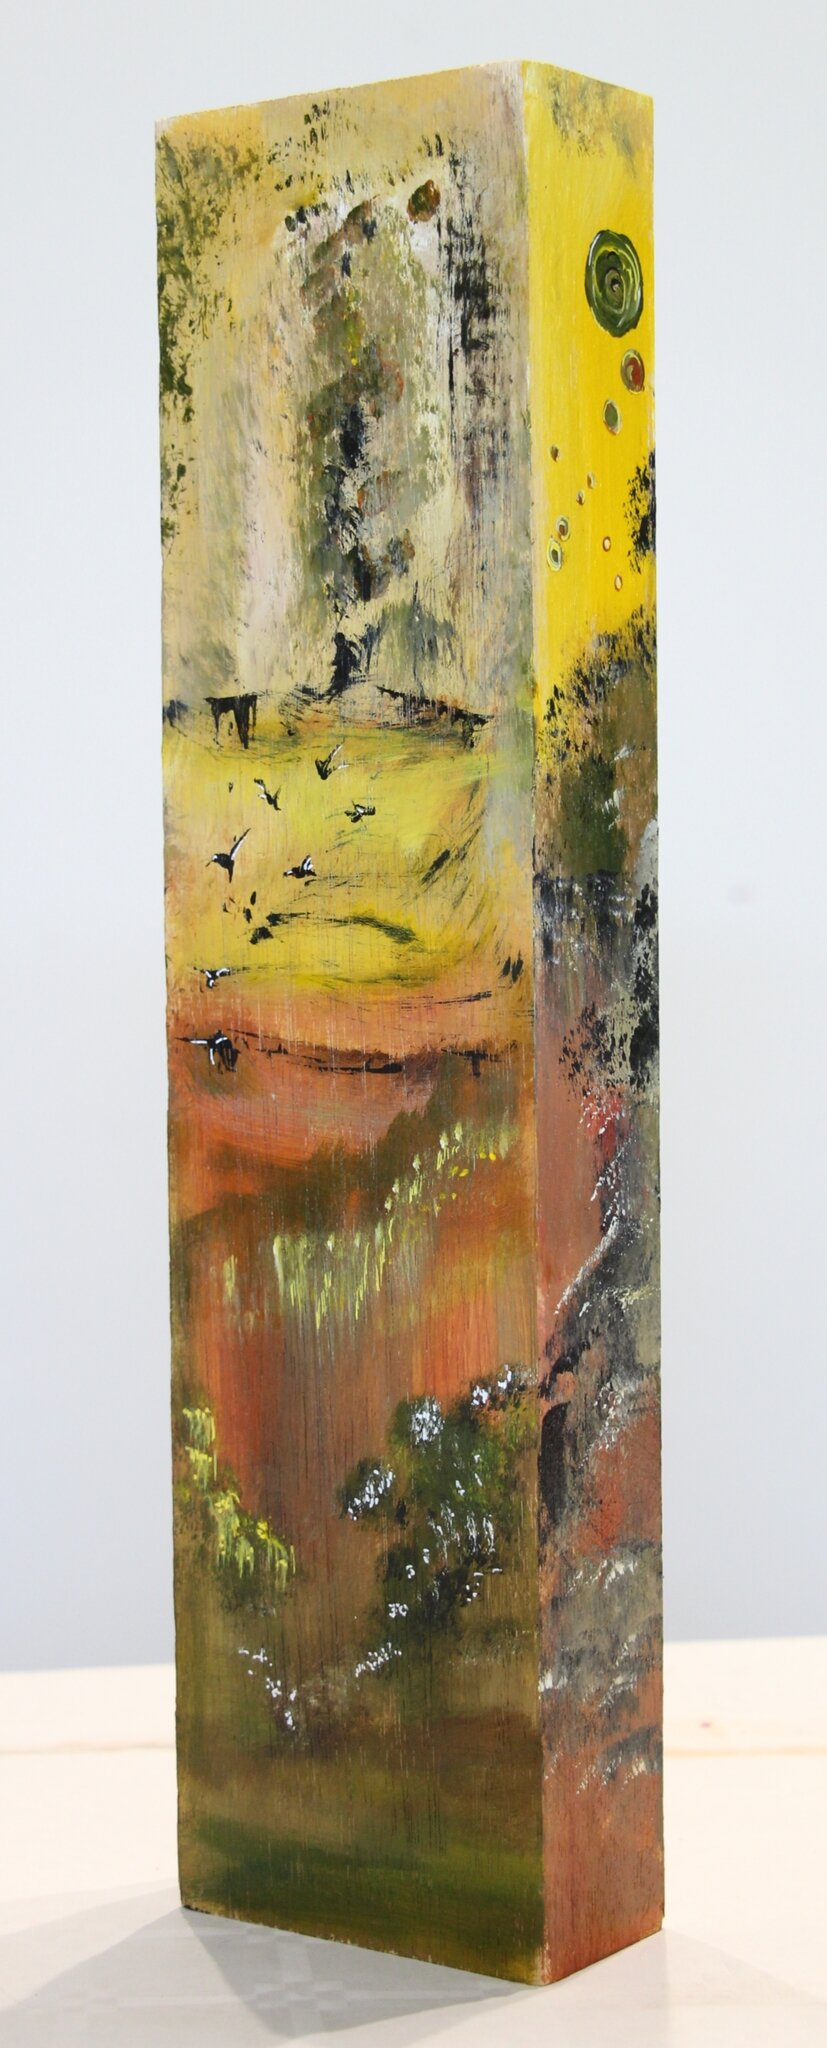 Sur bois 1- acryl 2019- 40X10X5cm - (n°158)